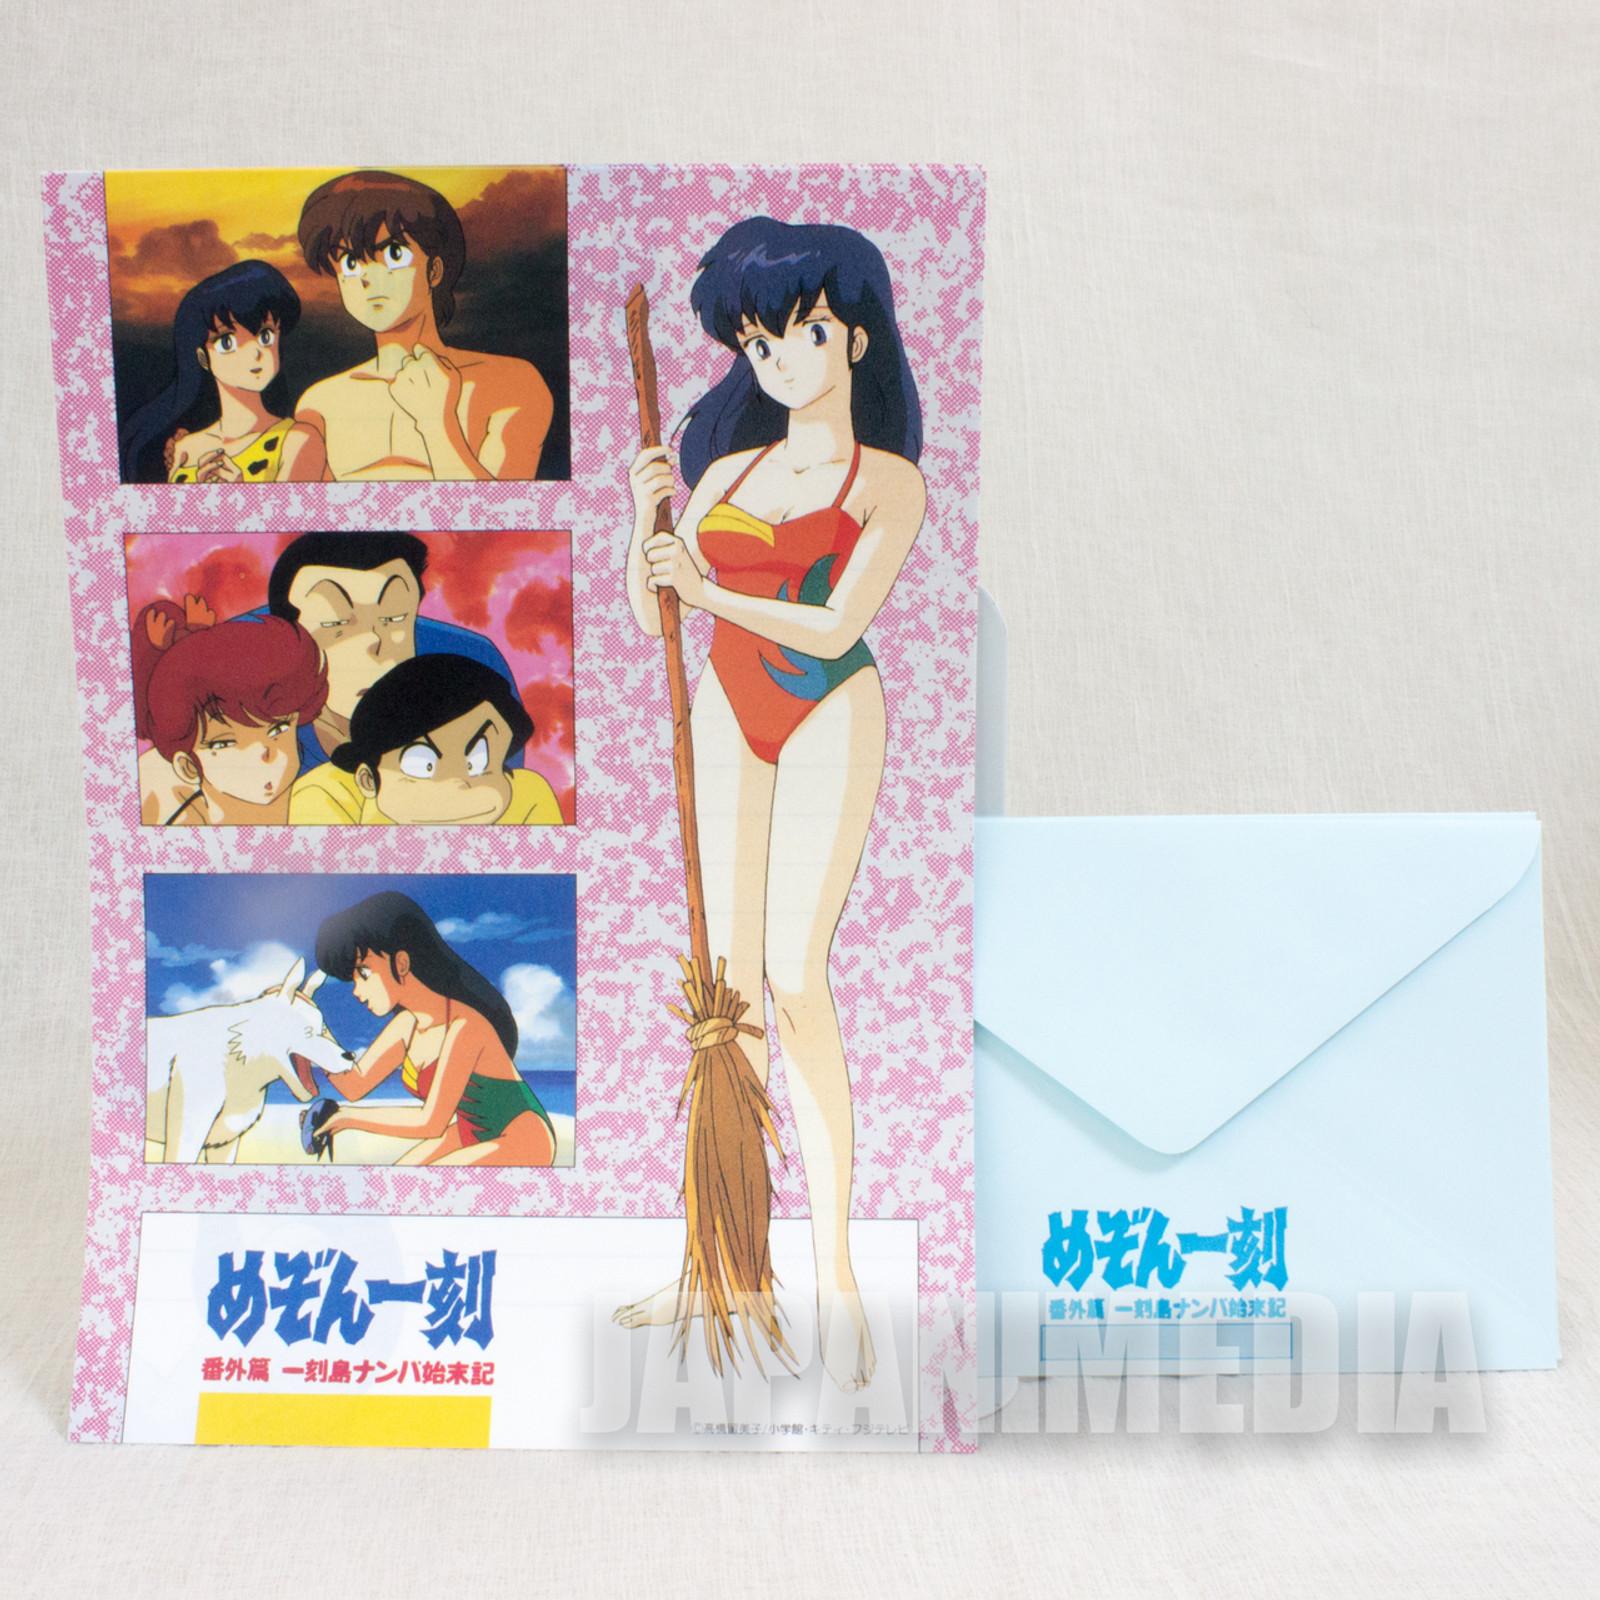 Retro RARE Maison Ikkoku Stationery Set [Envelope 4pc + Paper 6pc]  JAPAN ANIME MANGA